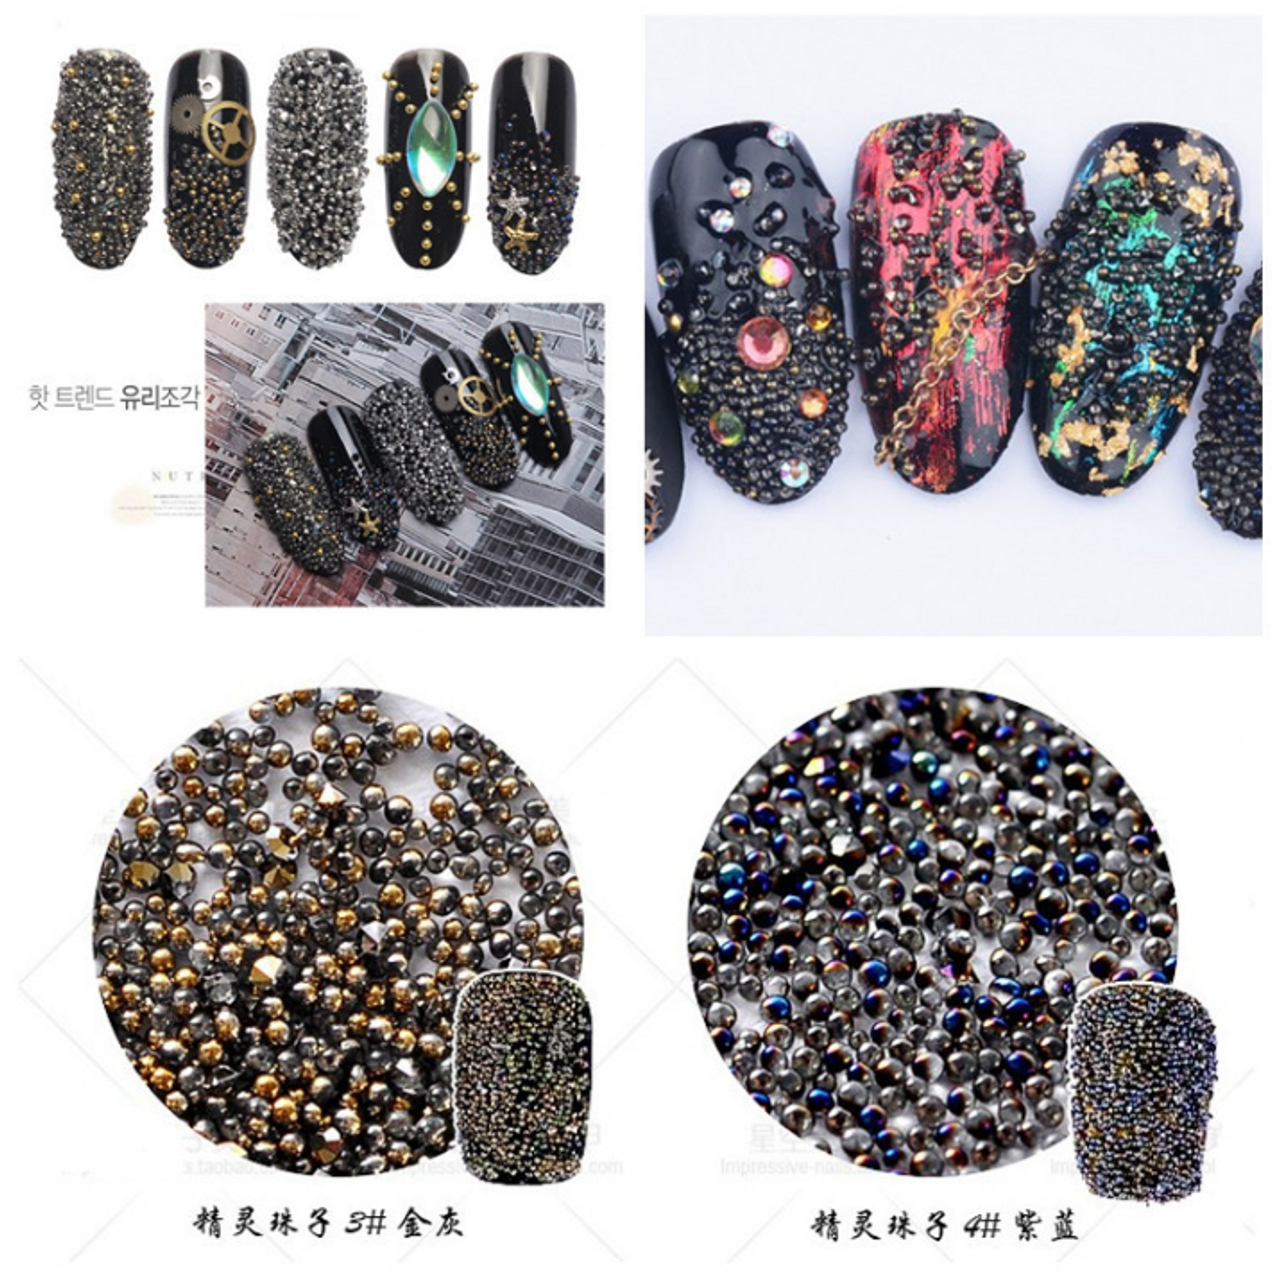 Galaxy Blue Black Micro Beads | Nail Art Beads | Micro Beads ...